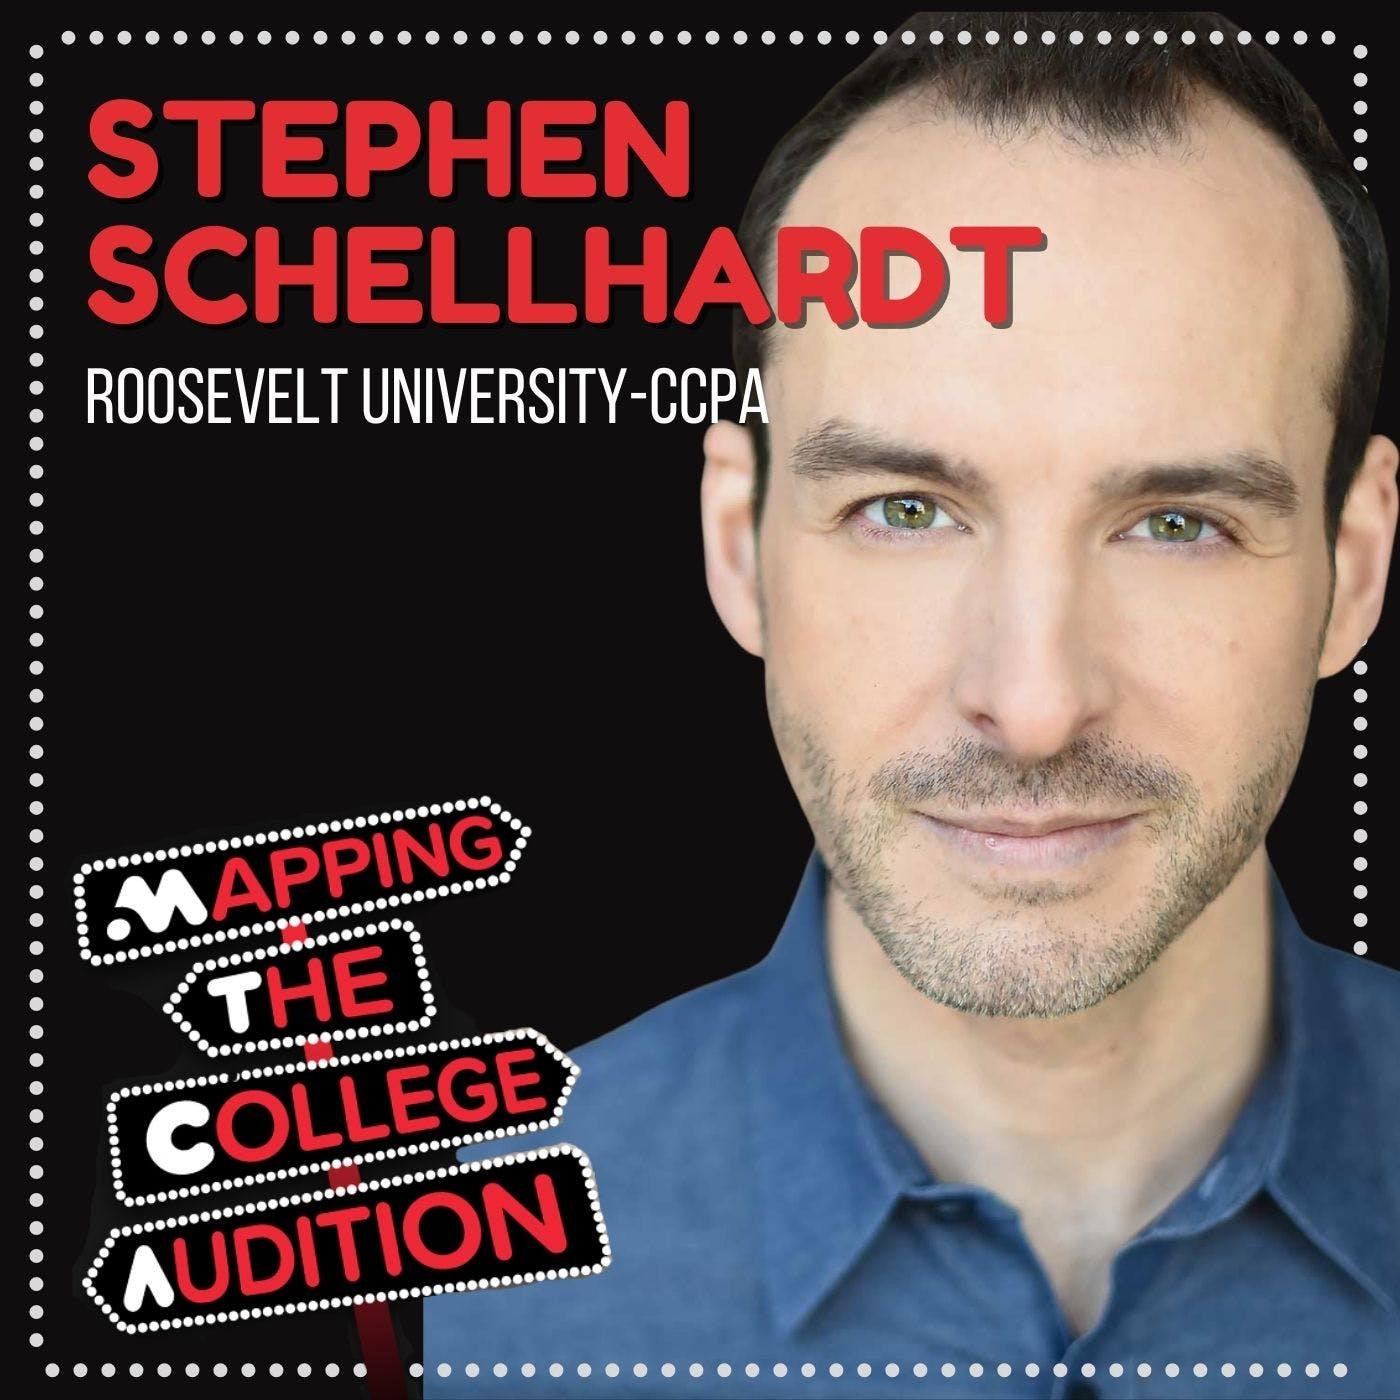 Ep. 24 (CDD): Stephen Schellhardt from Roosevelt University-CCPA on Training Artist-Citizens